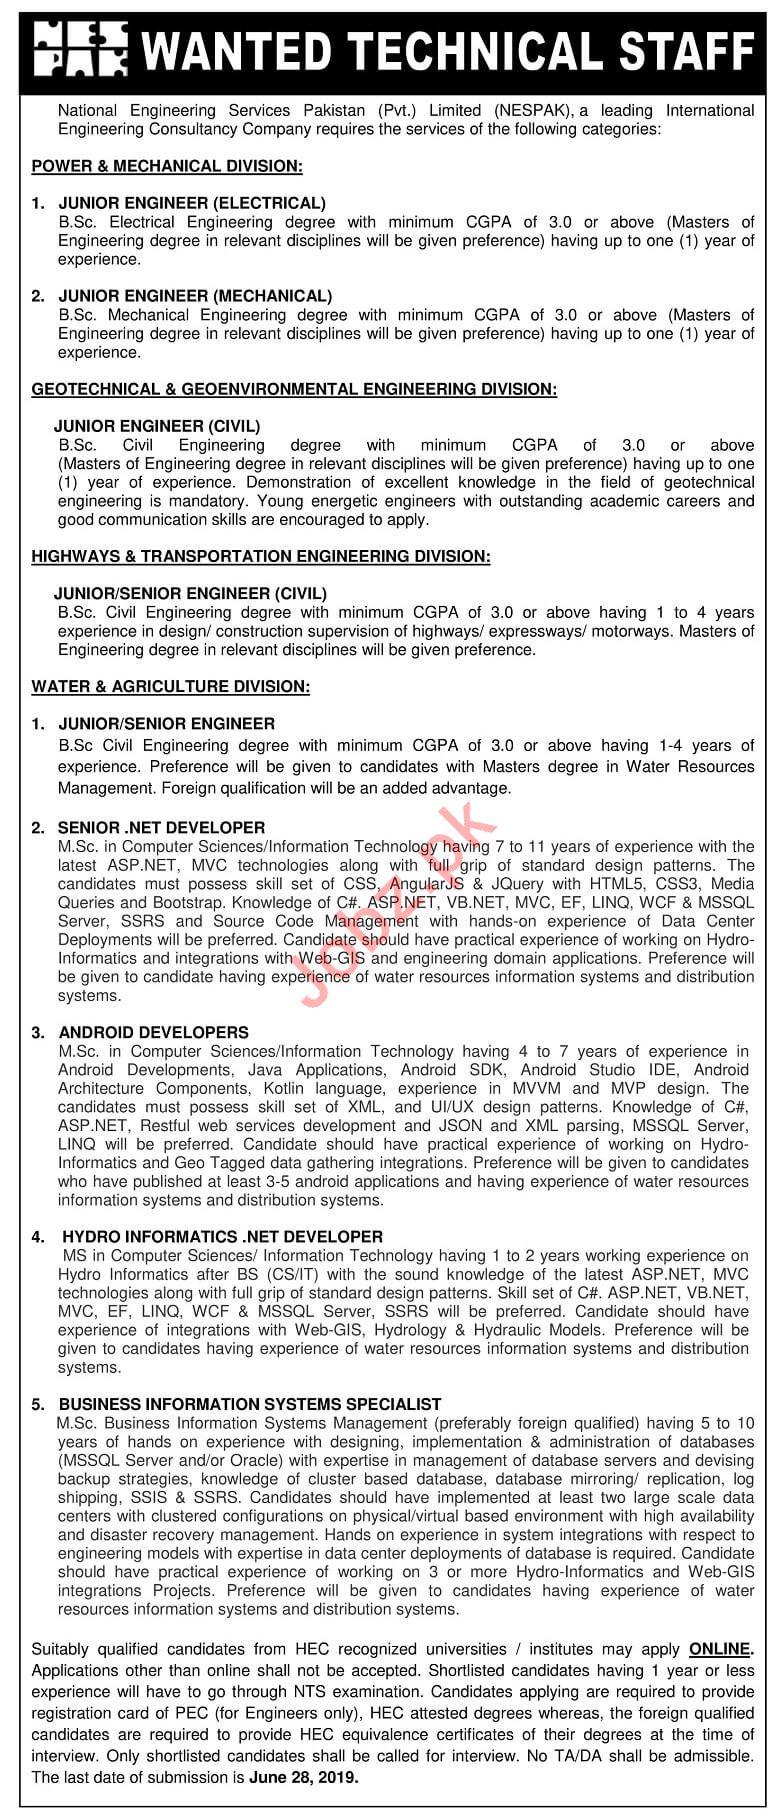 National Engineering Services Pakistan NESPAK Jobs 2019